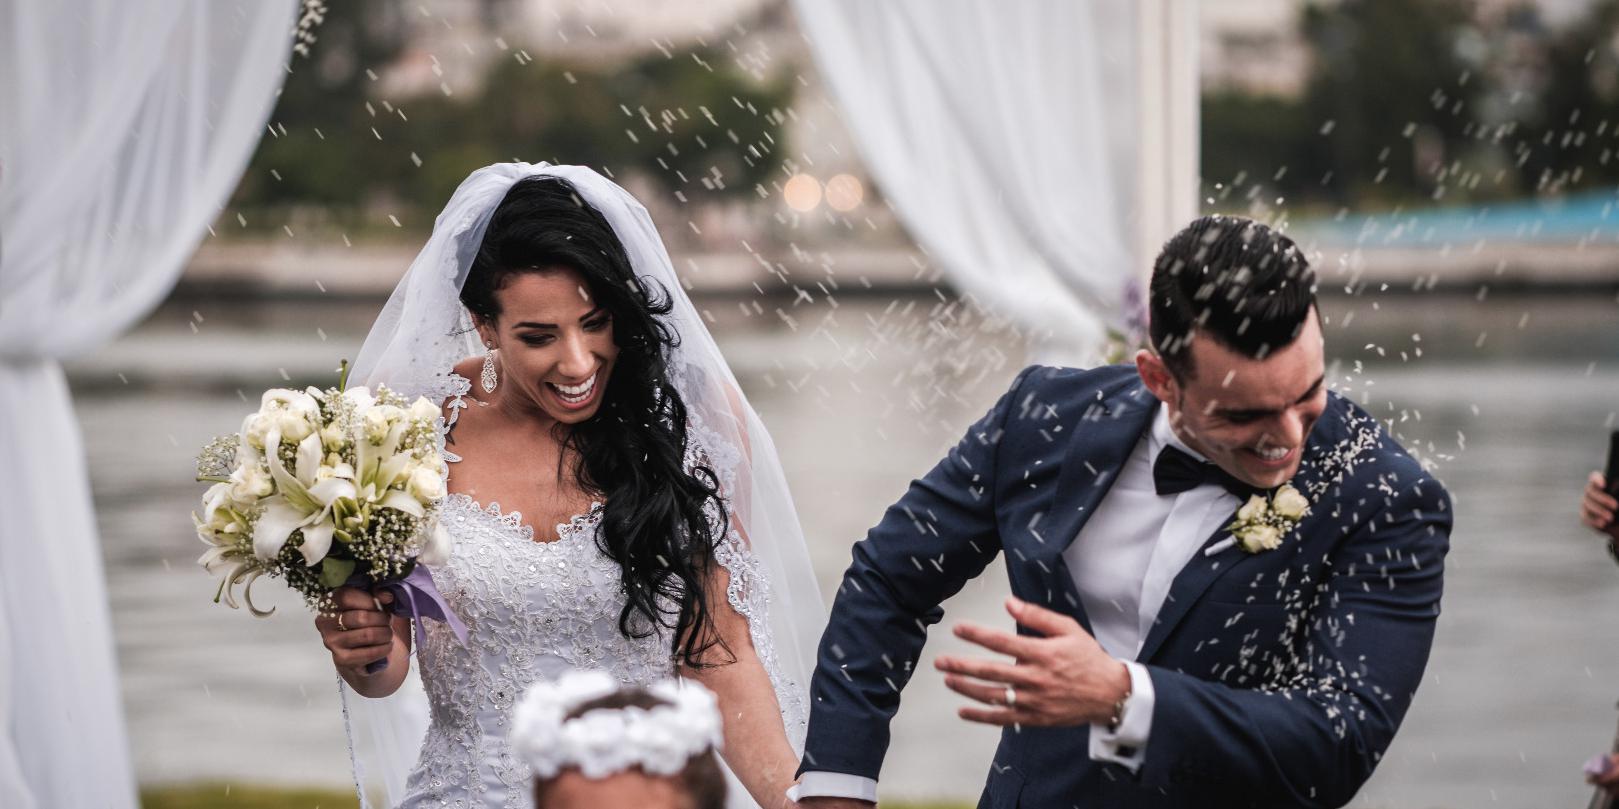 bodas-sin-clasificar-sin-tema-cuba-35951.jpg